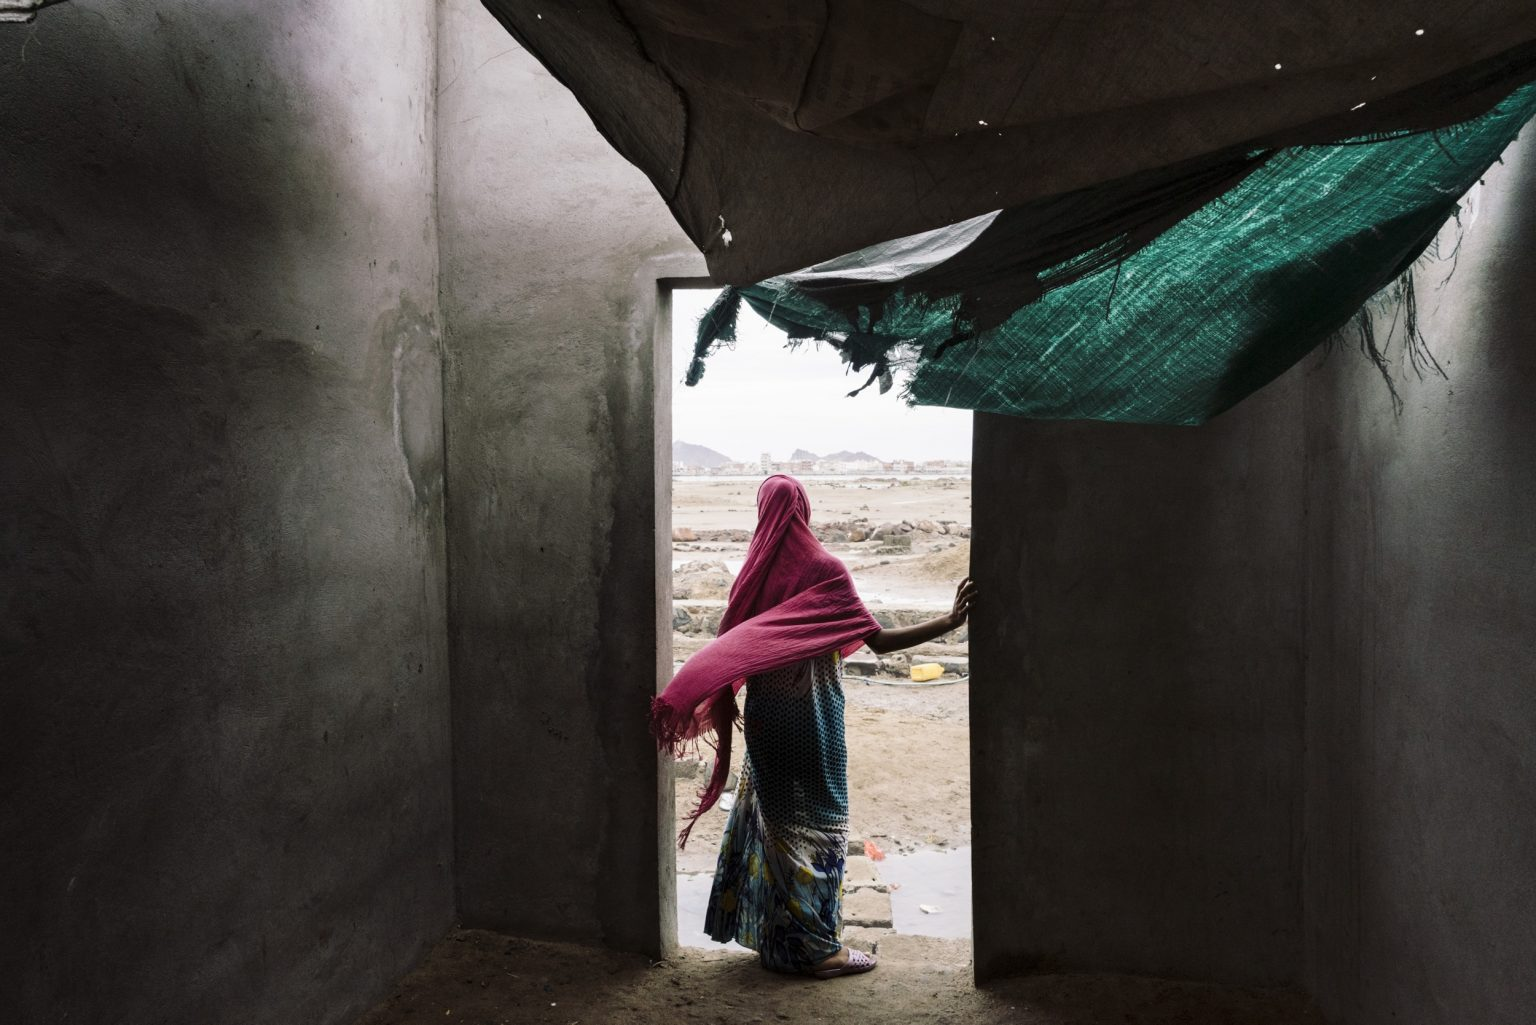 humanitarian-crisis-in-yemen-crisi-umanitaria